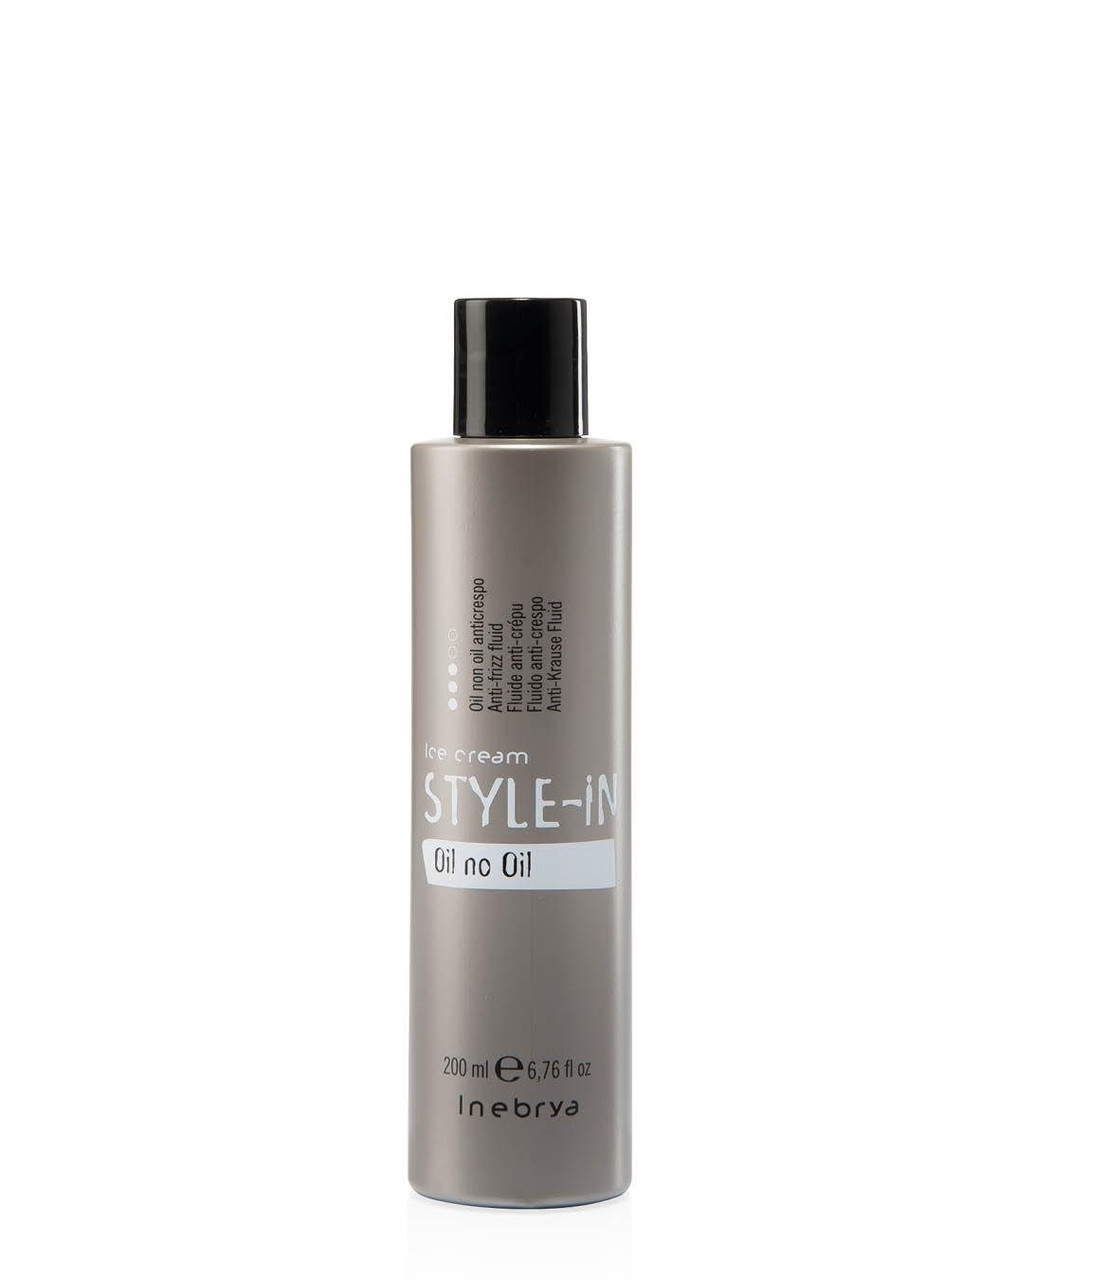 Inebrya Style-In Oil no Oil Разглаживающий флюид  200 мл